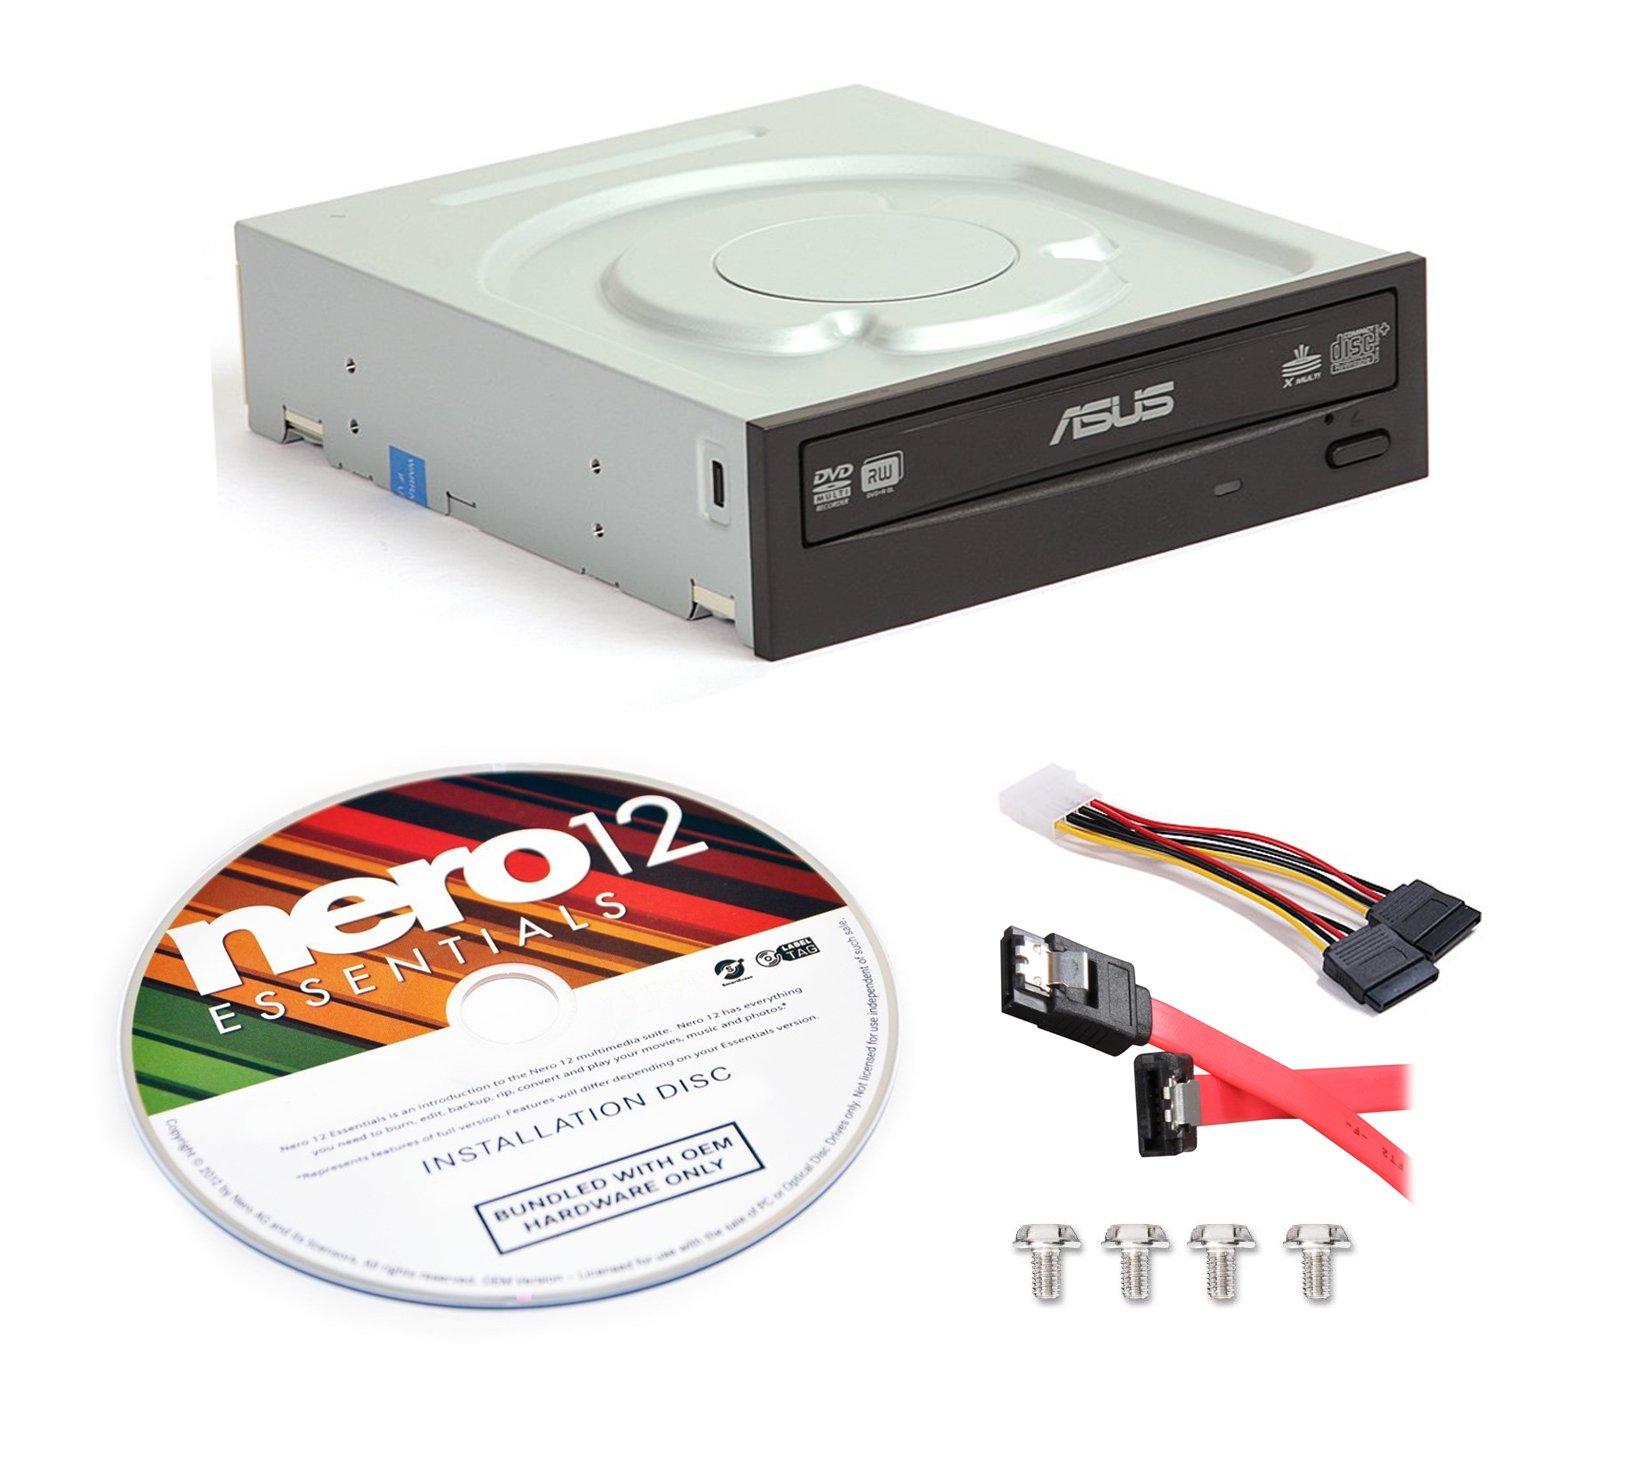 Asus DRW-24B1ST-KIT 24x Internal DVD Burner + Nero 12 Essentials Burning Software + Sata Cable Kit by BestDuplicator